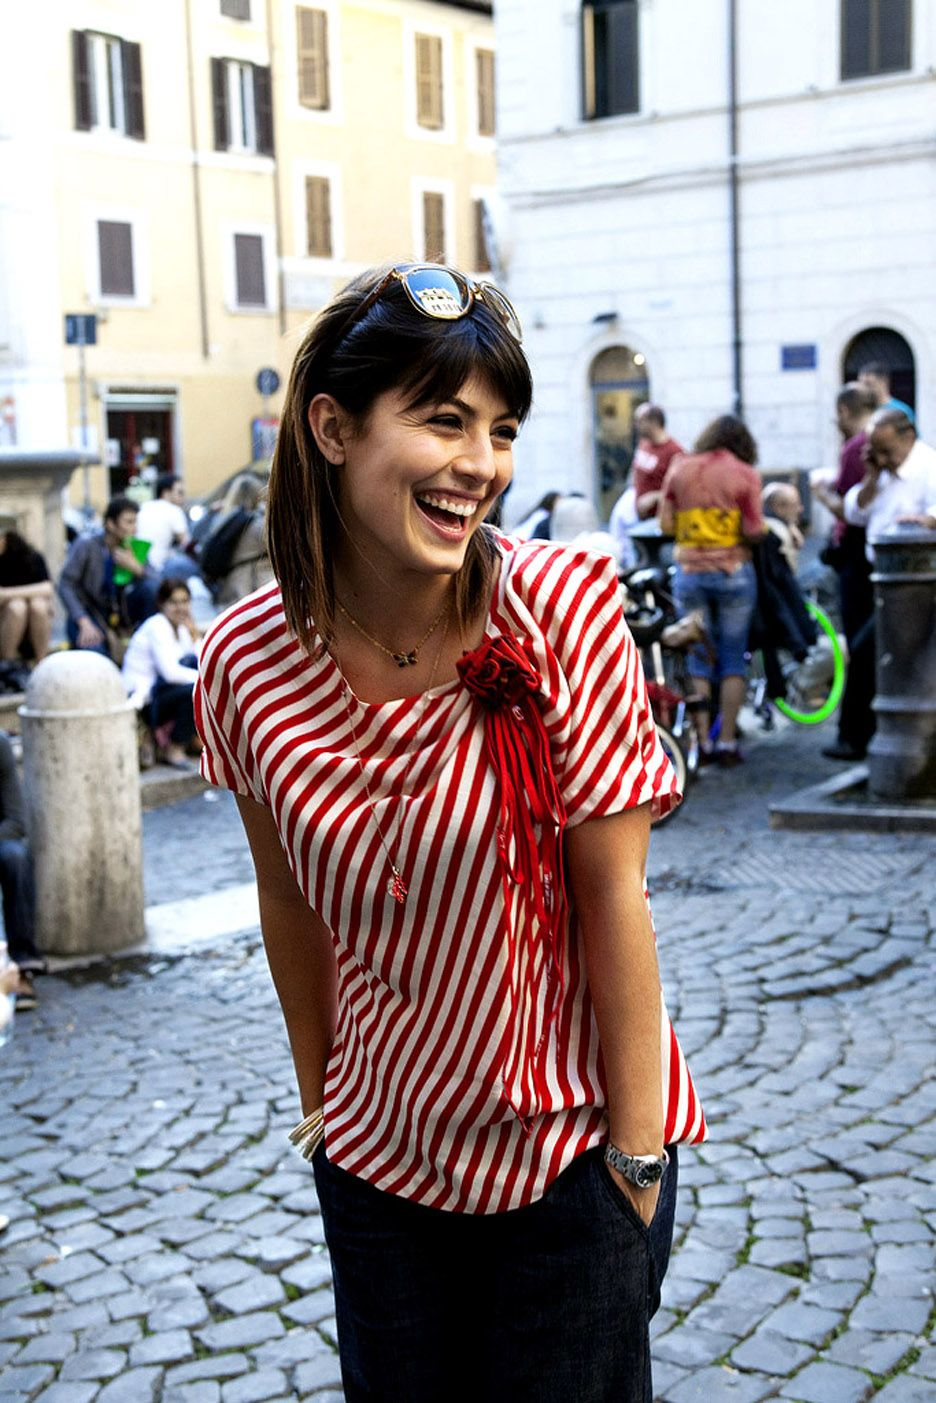 Alessandra Mastronardi  Italian Street Style. Alessandra Mastronardi   Italian Street Style Stile Delle Donne ... 24de5c4f0a1c